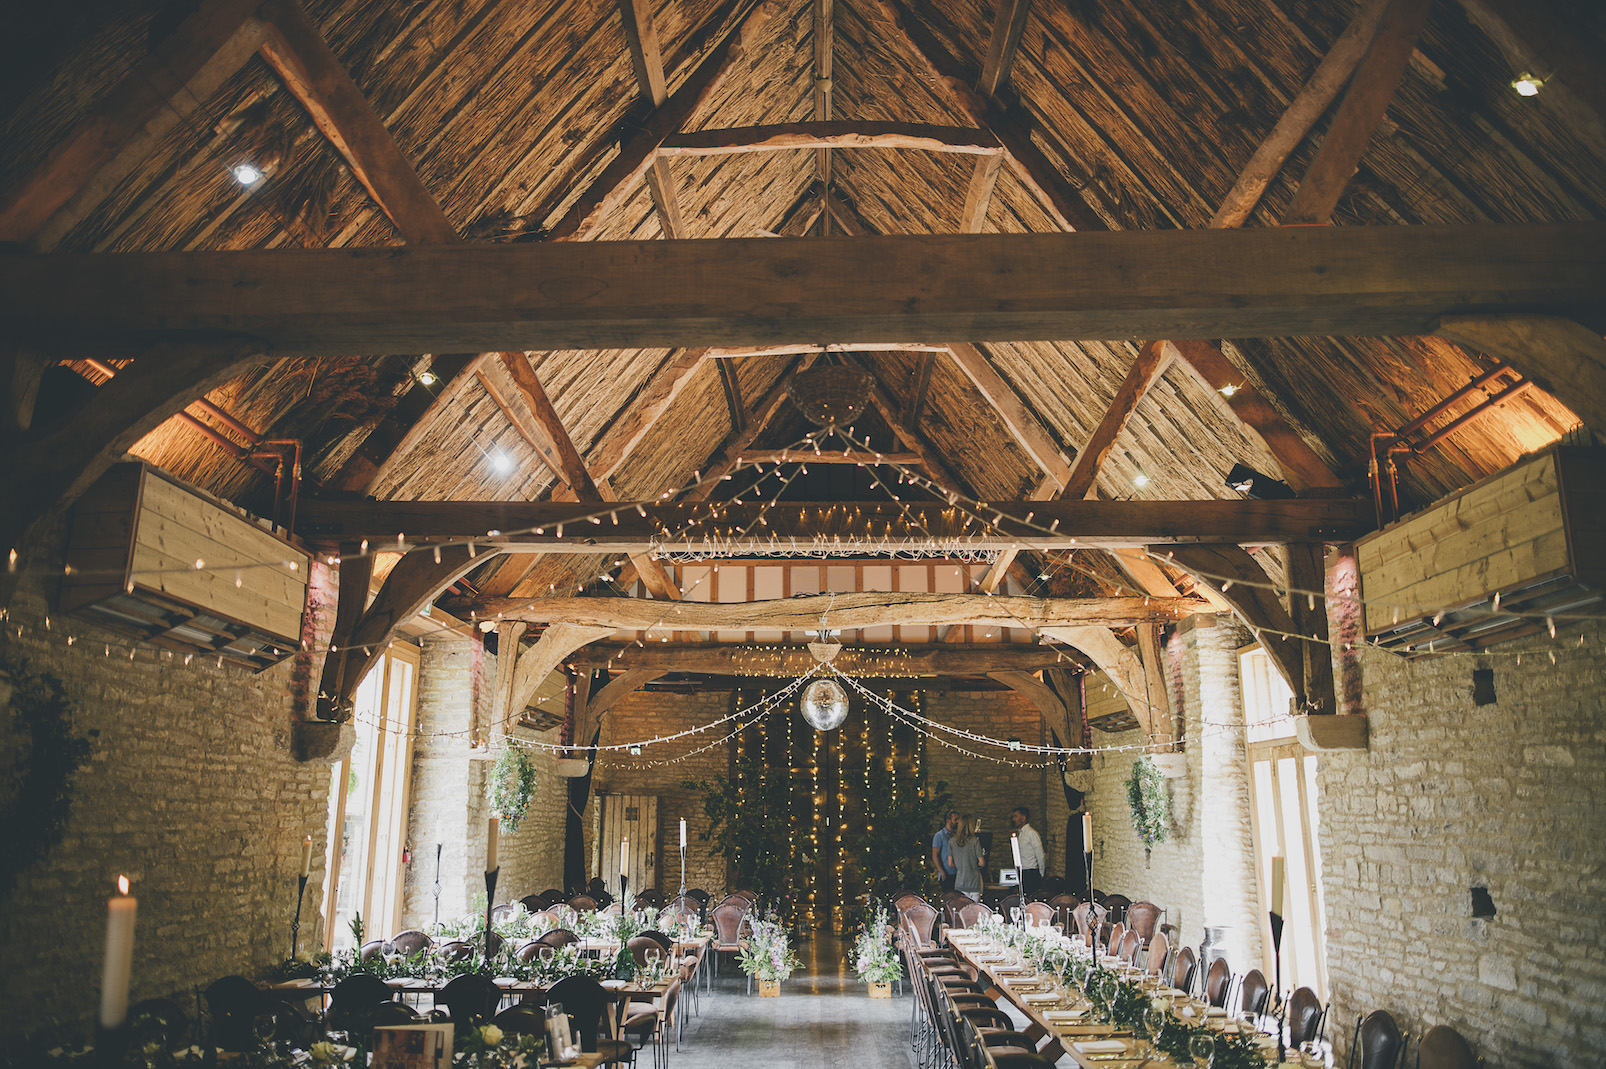 CopyrightDearestLove The Tythe Barn Launton Oxfordshire